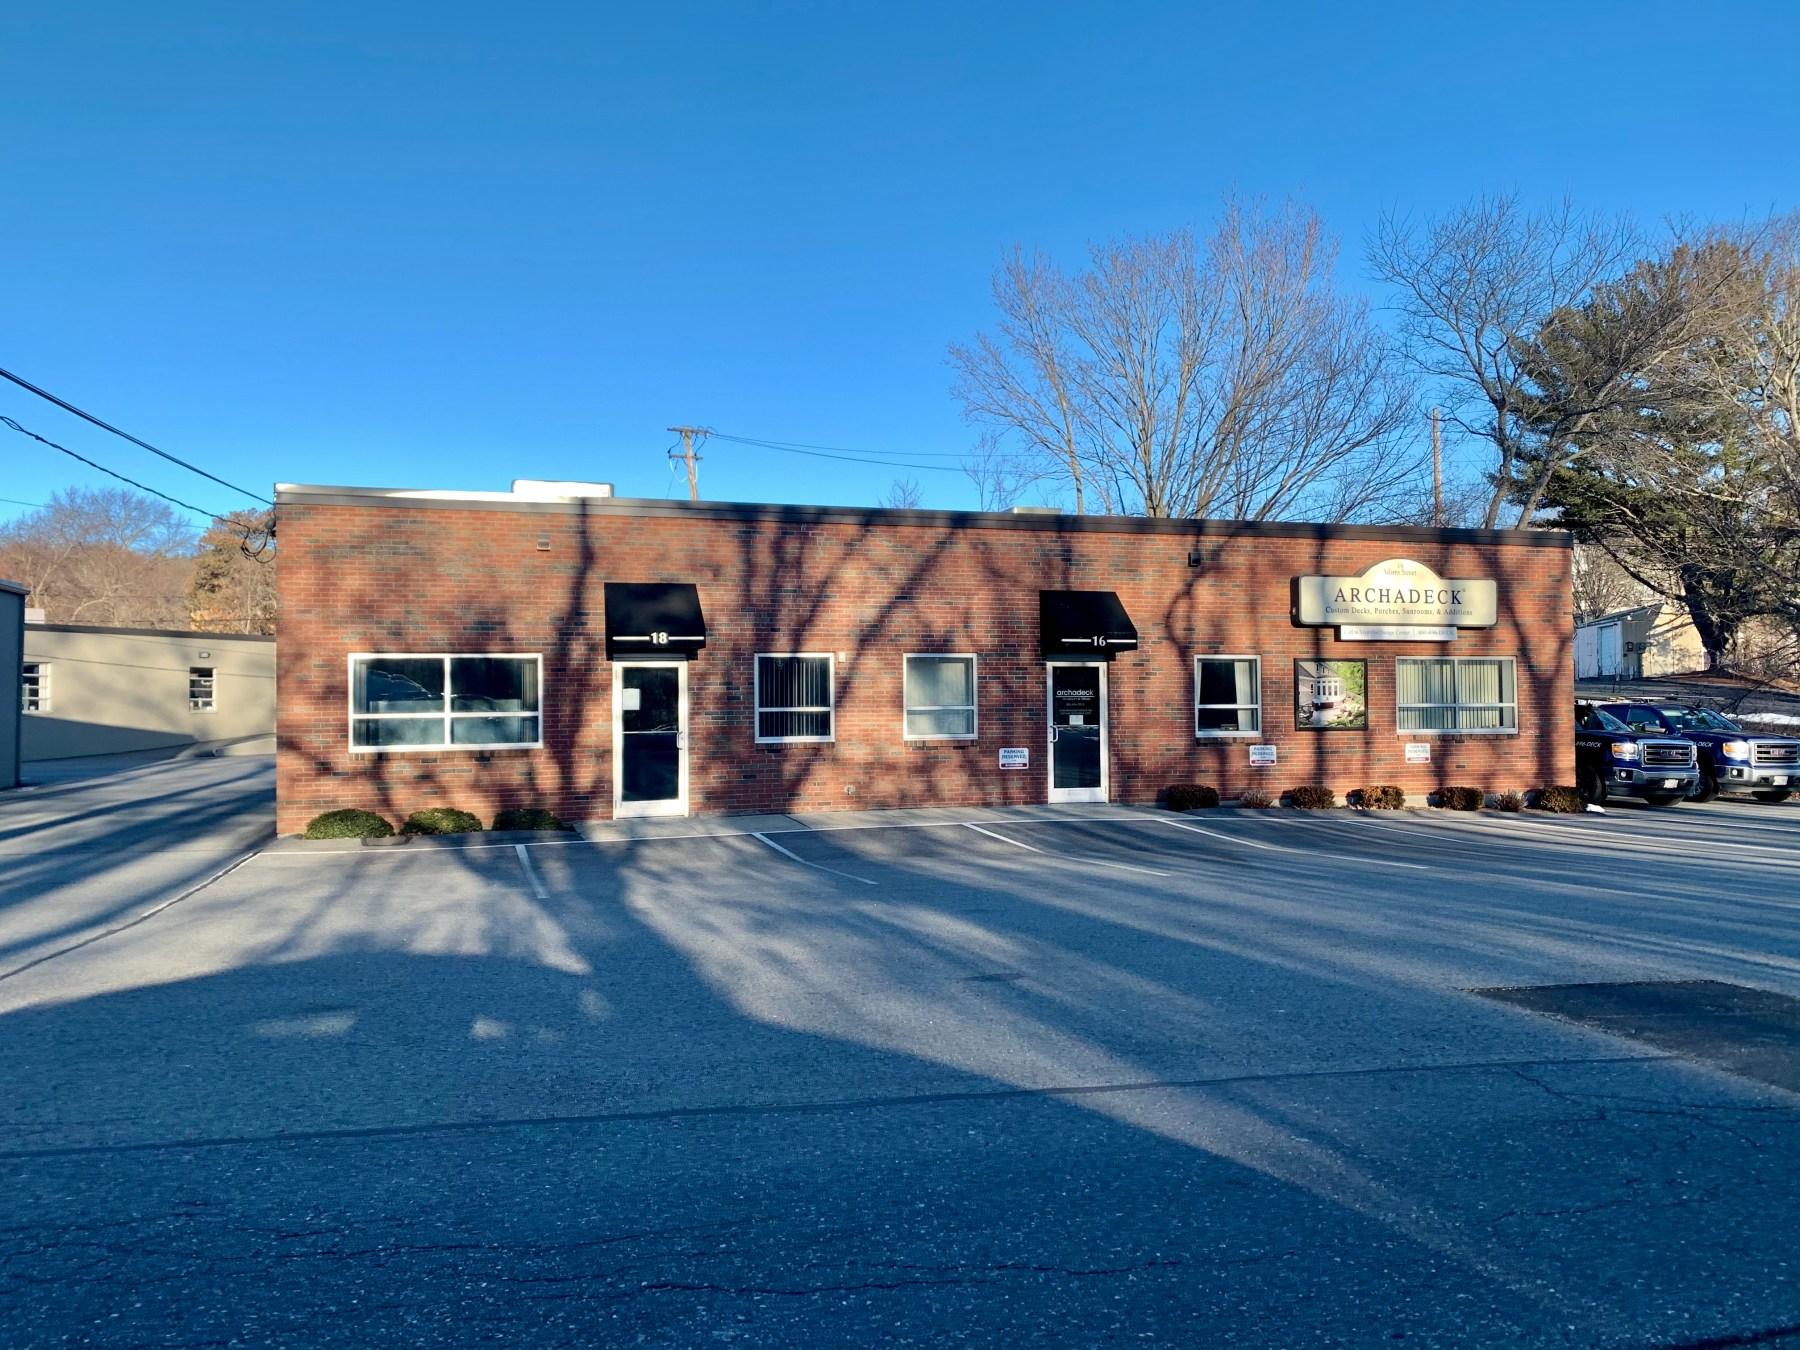 16-18 Adams Street, Burlington MA including Archadeck